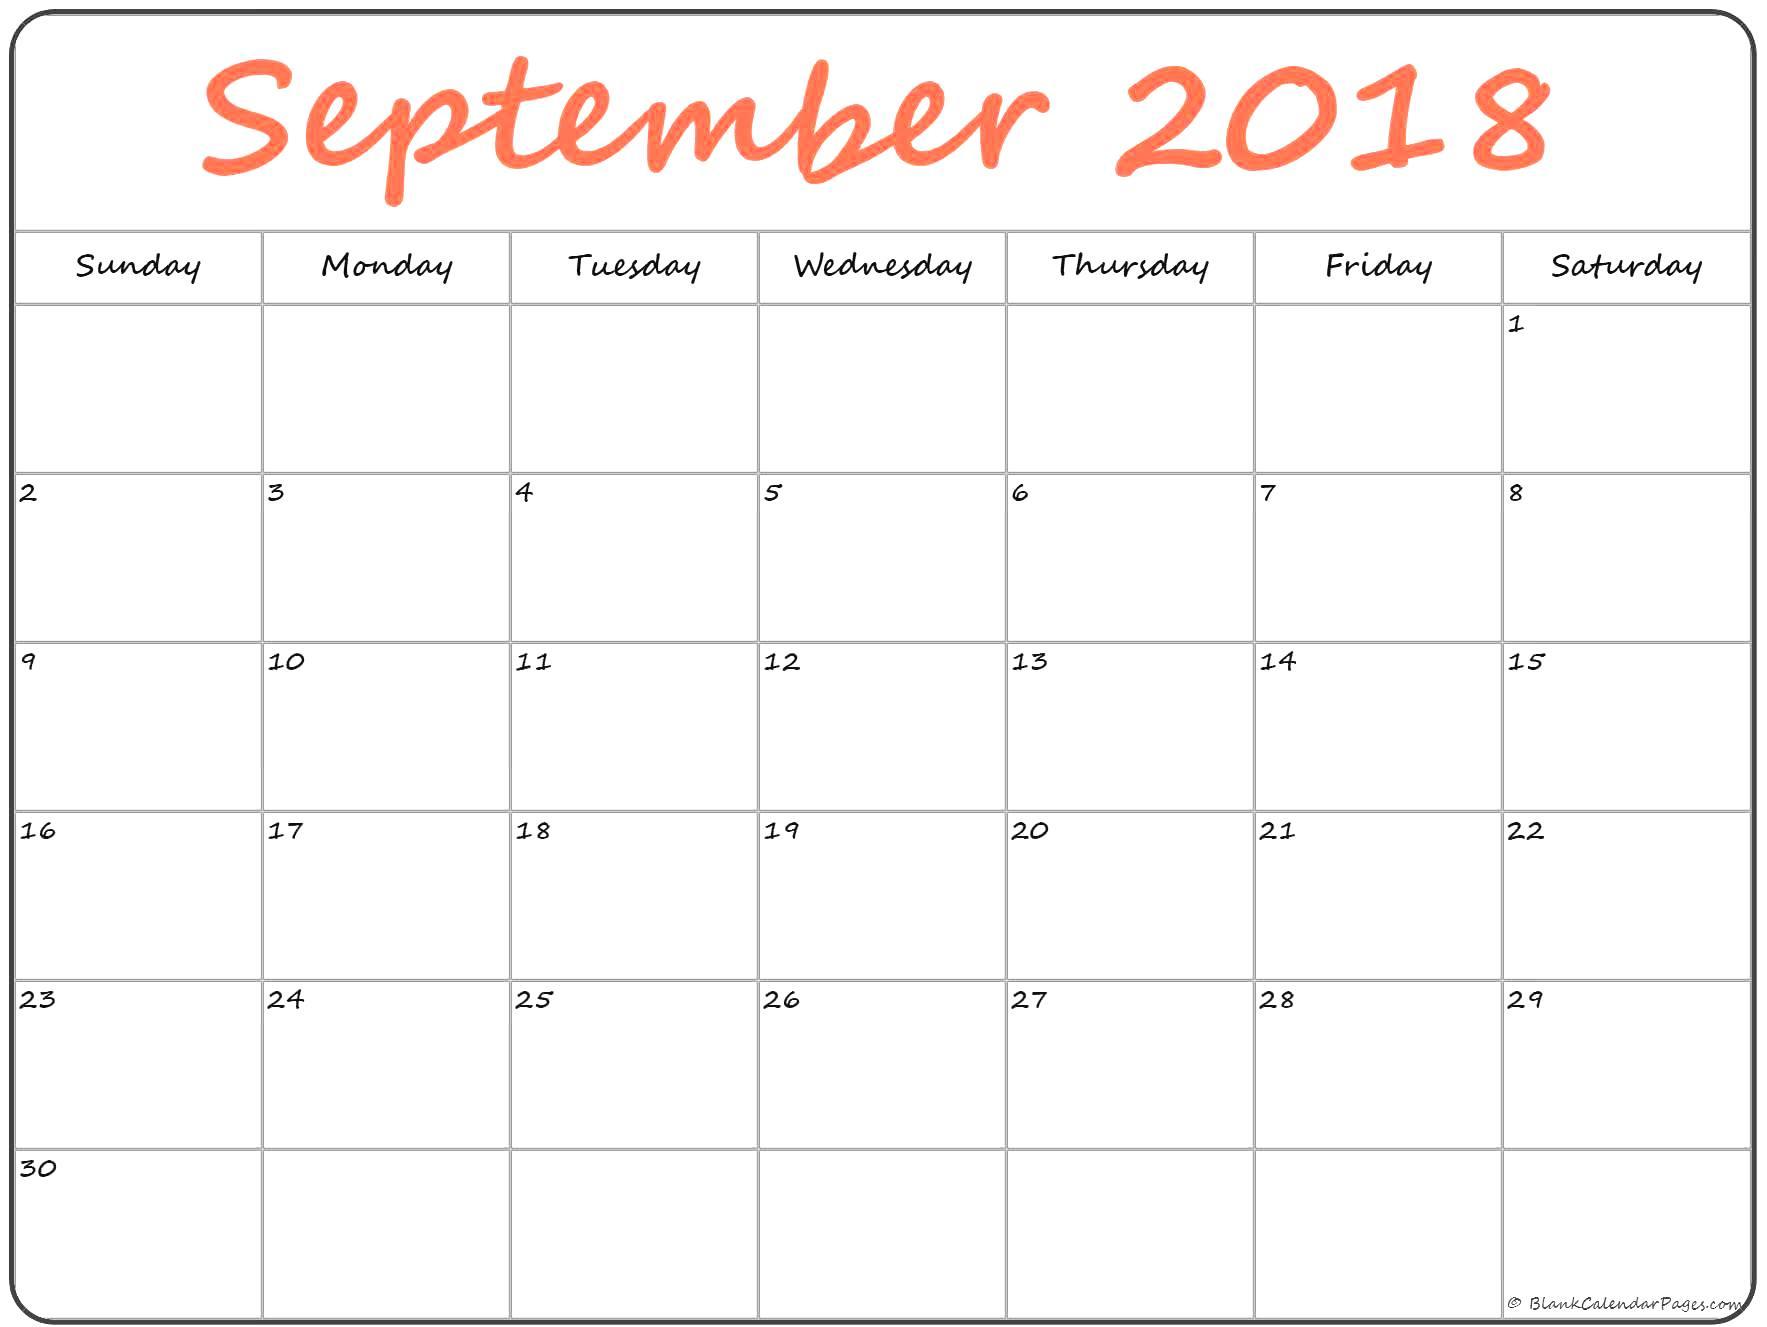 Free September 2018 Calendar Printable Online Download within Blank Monthly Calendar September